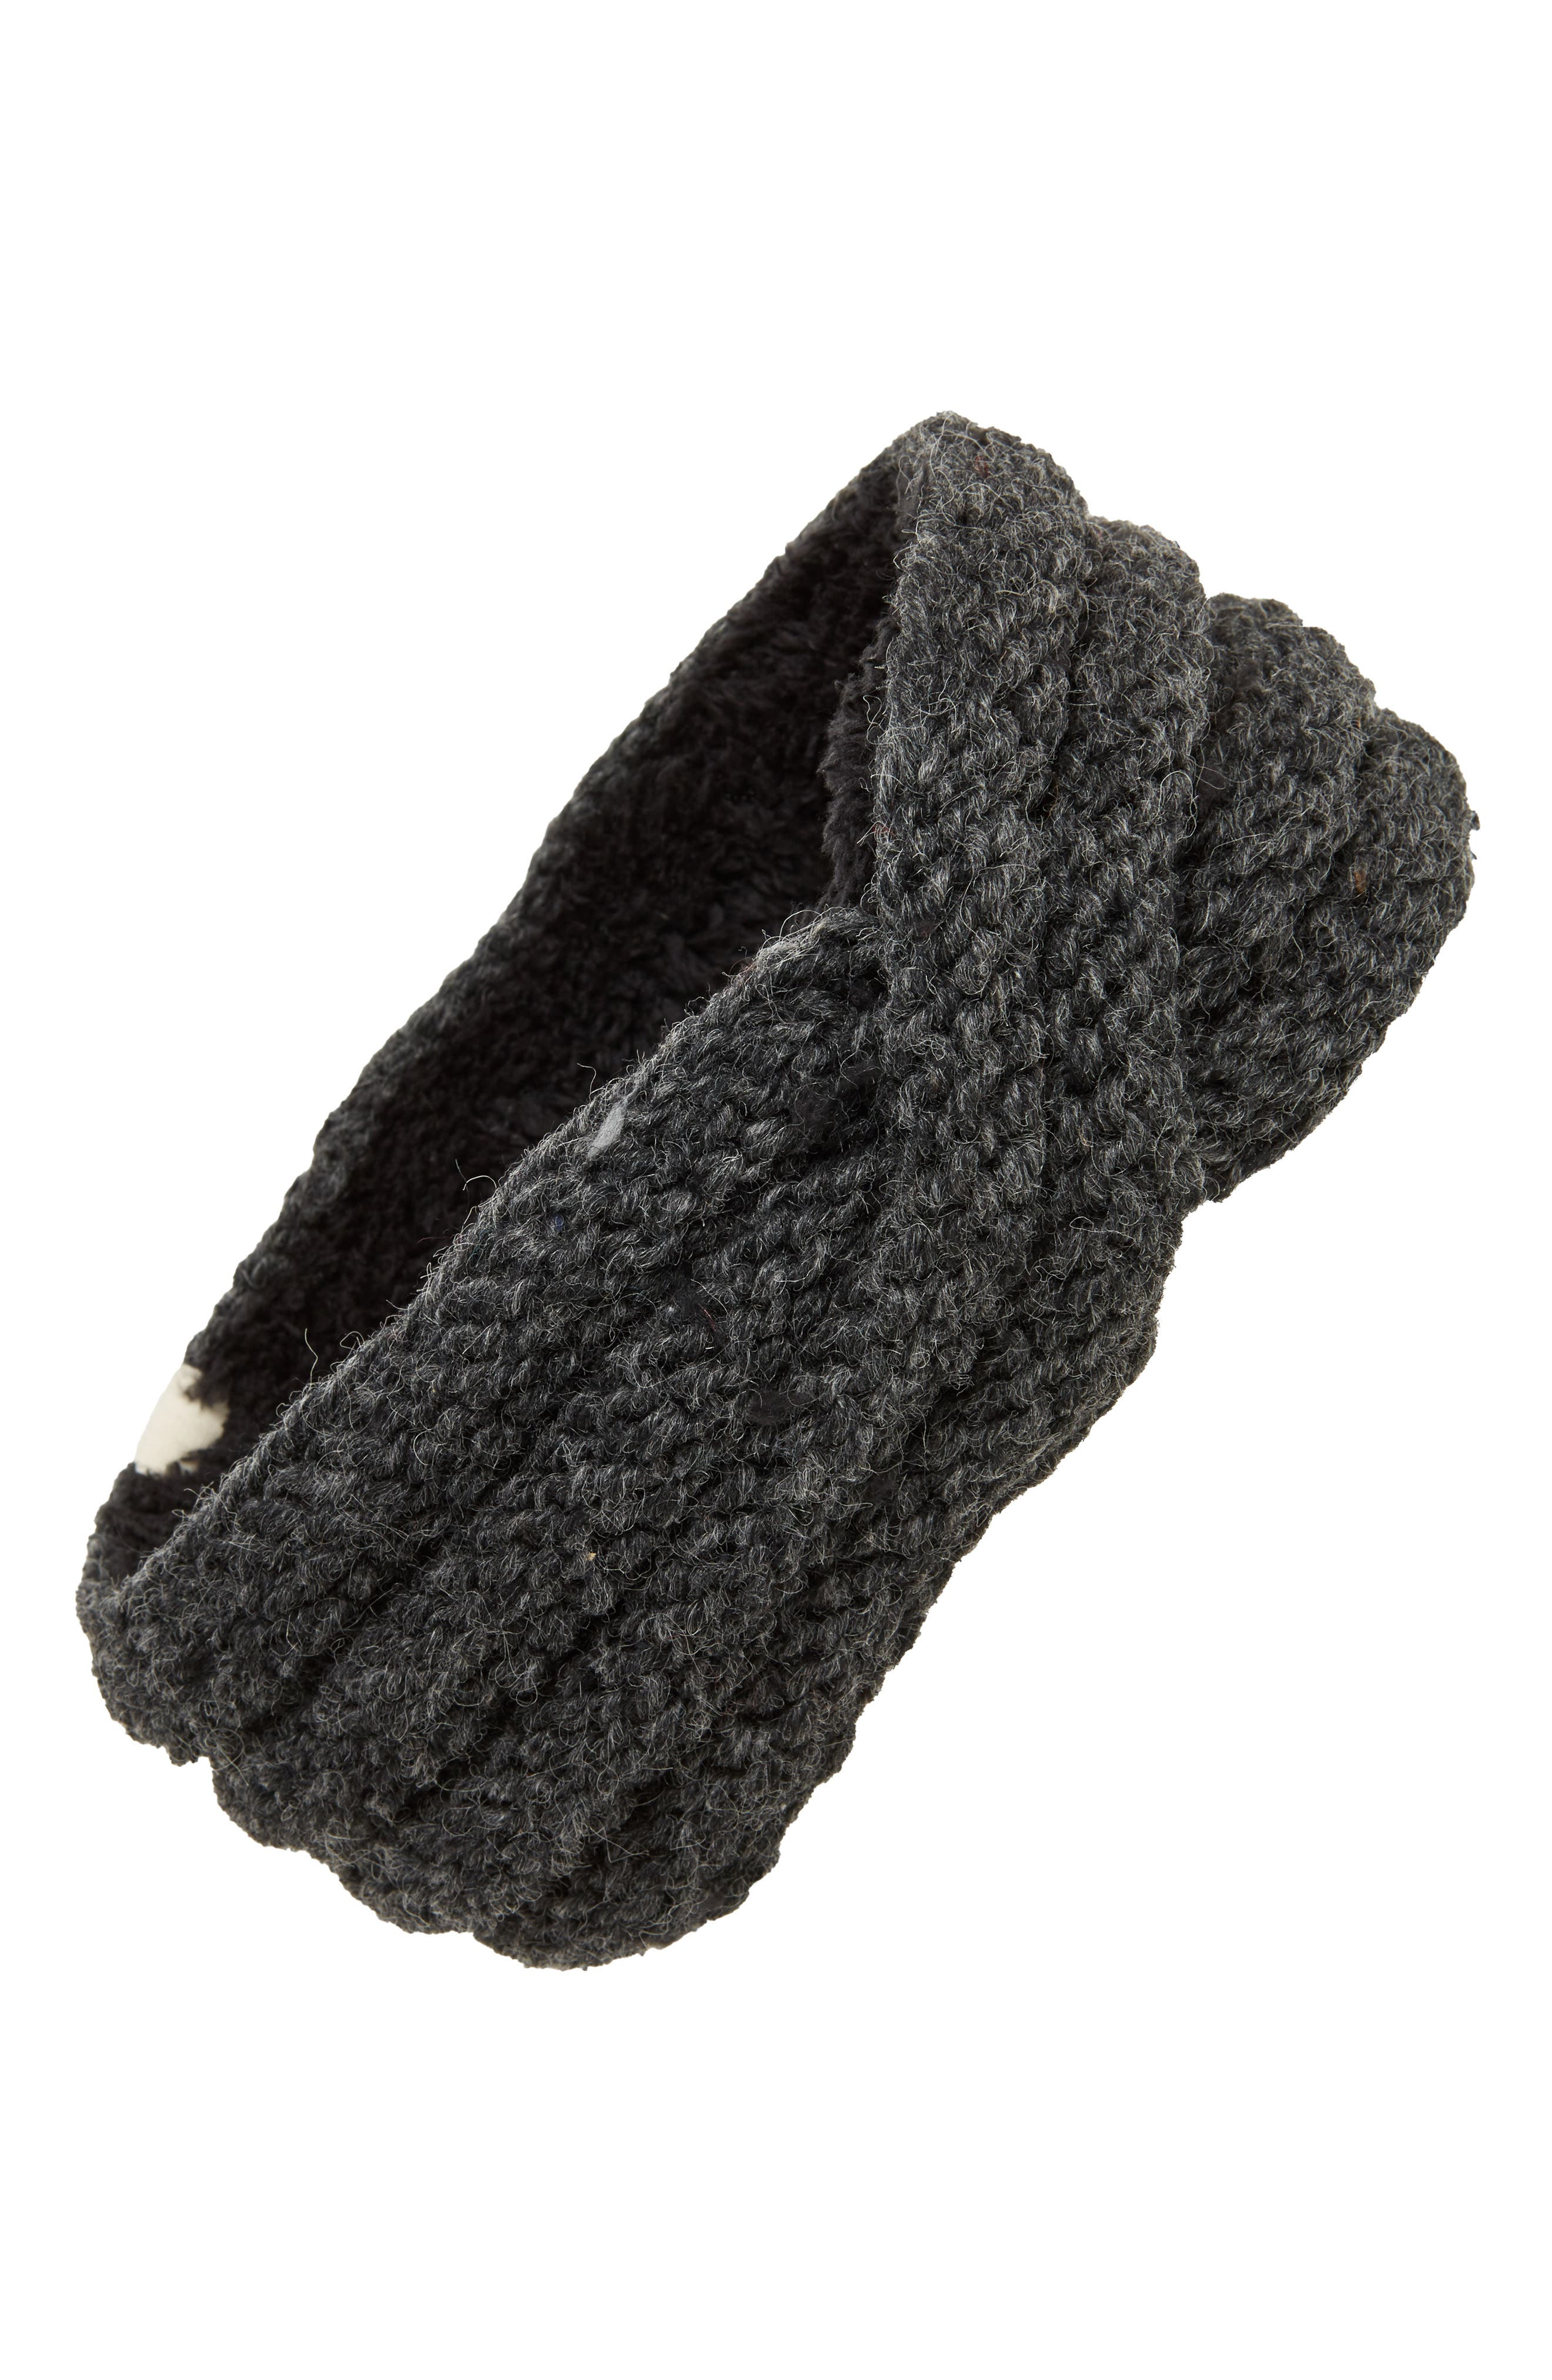 Nirvanna Designs Veronica Cabled Wool Headband